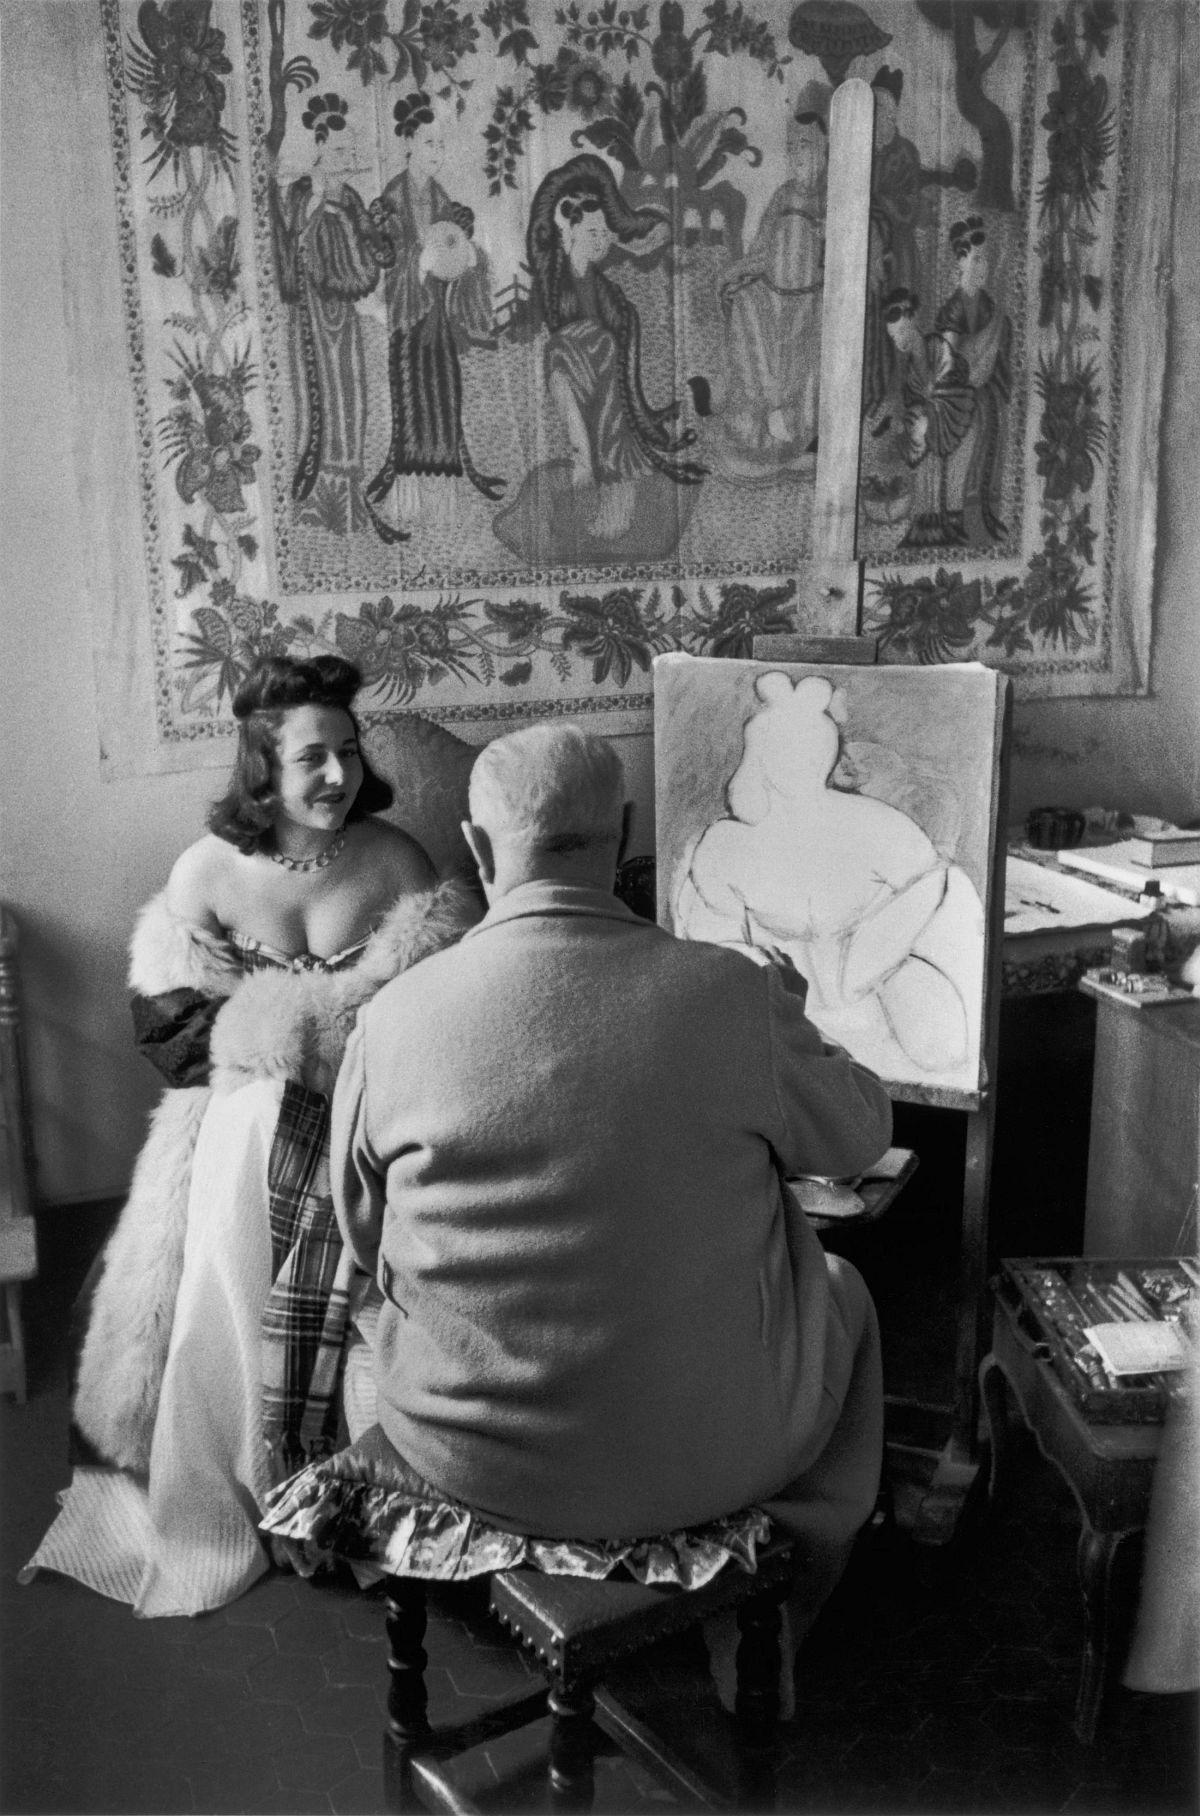 Henri Cartier-Bresson, The Decisive Moment (Simon & Schuster, 1952), p. 69, Henri Matisse and His Model Micaela Avogadro, Vence, France, 1944. © Henri Cartier-Bresson/Magnum Photos.